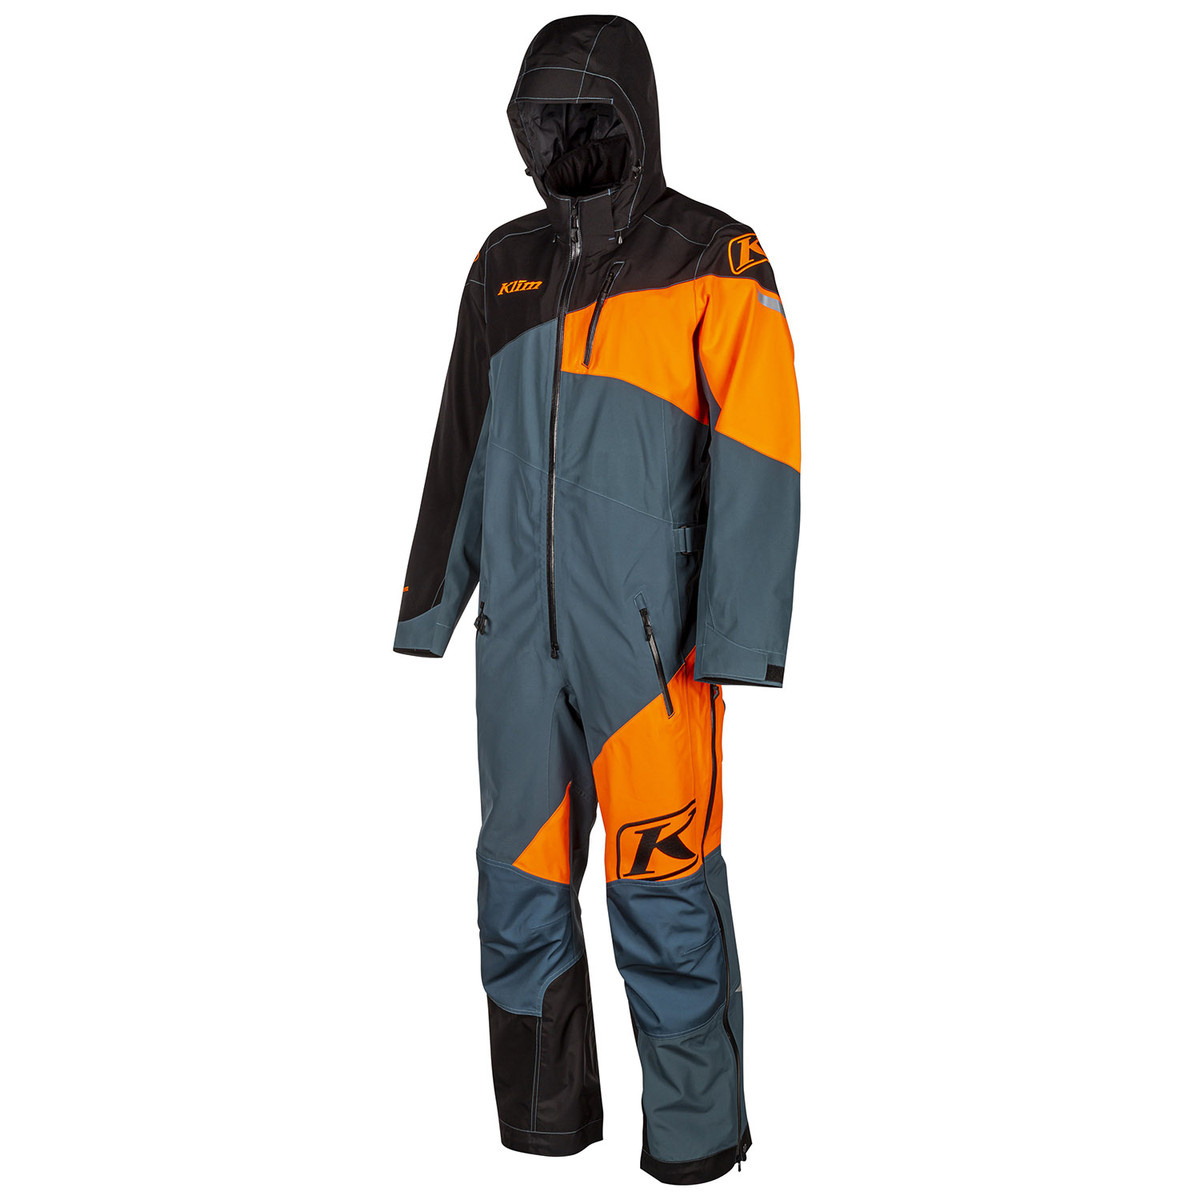 Womens Snowmobile Suits >> New 2019 20 Women S Snowmobile Gear Klim